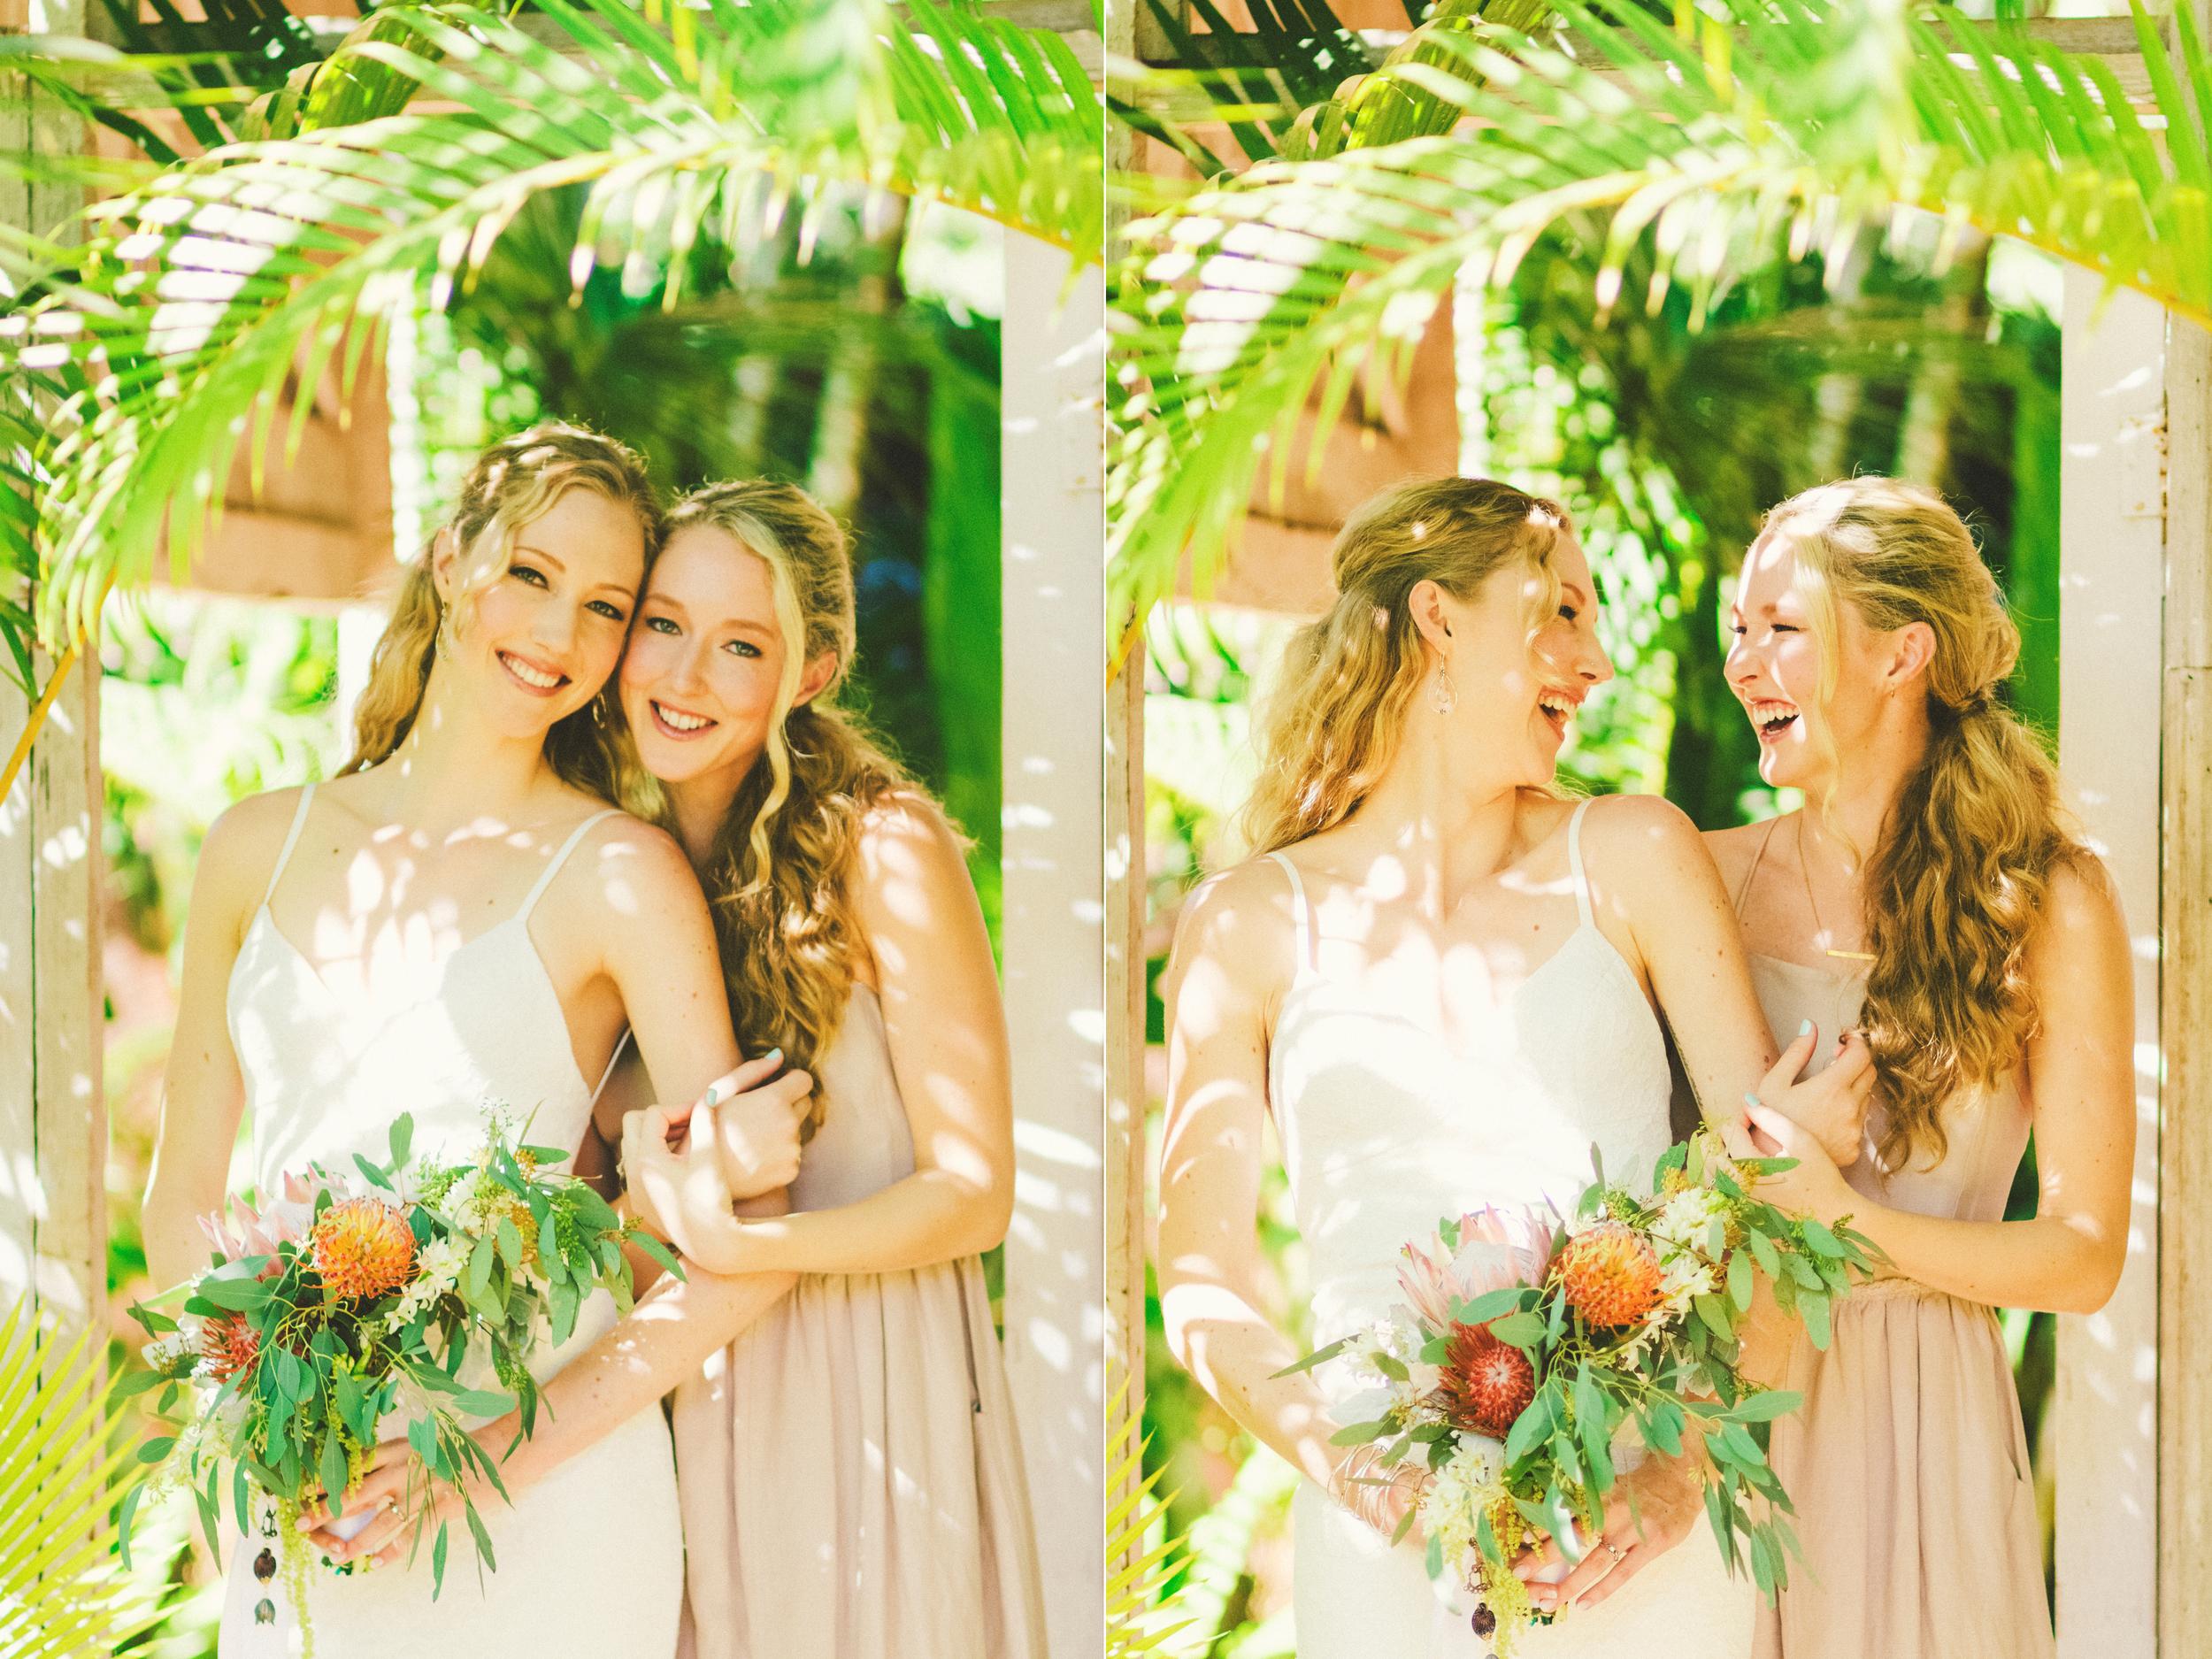 angie-diaz-photography-maui-wedding-40.jpg